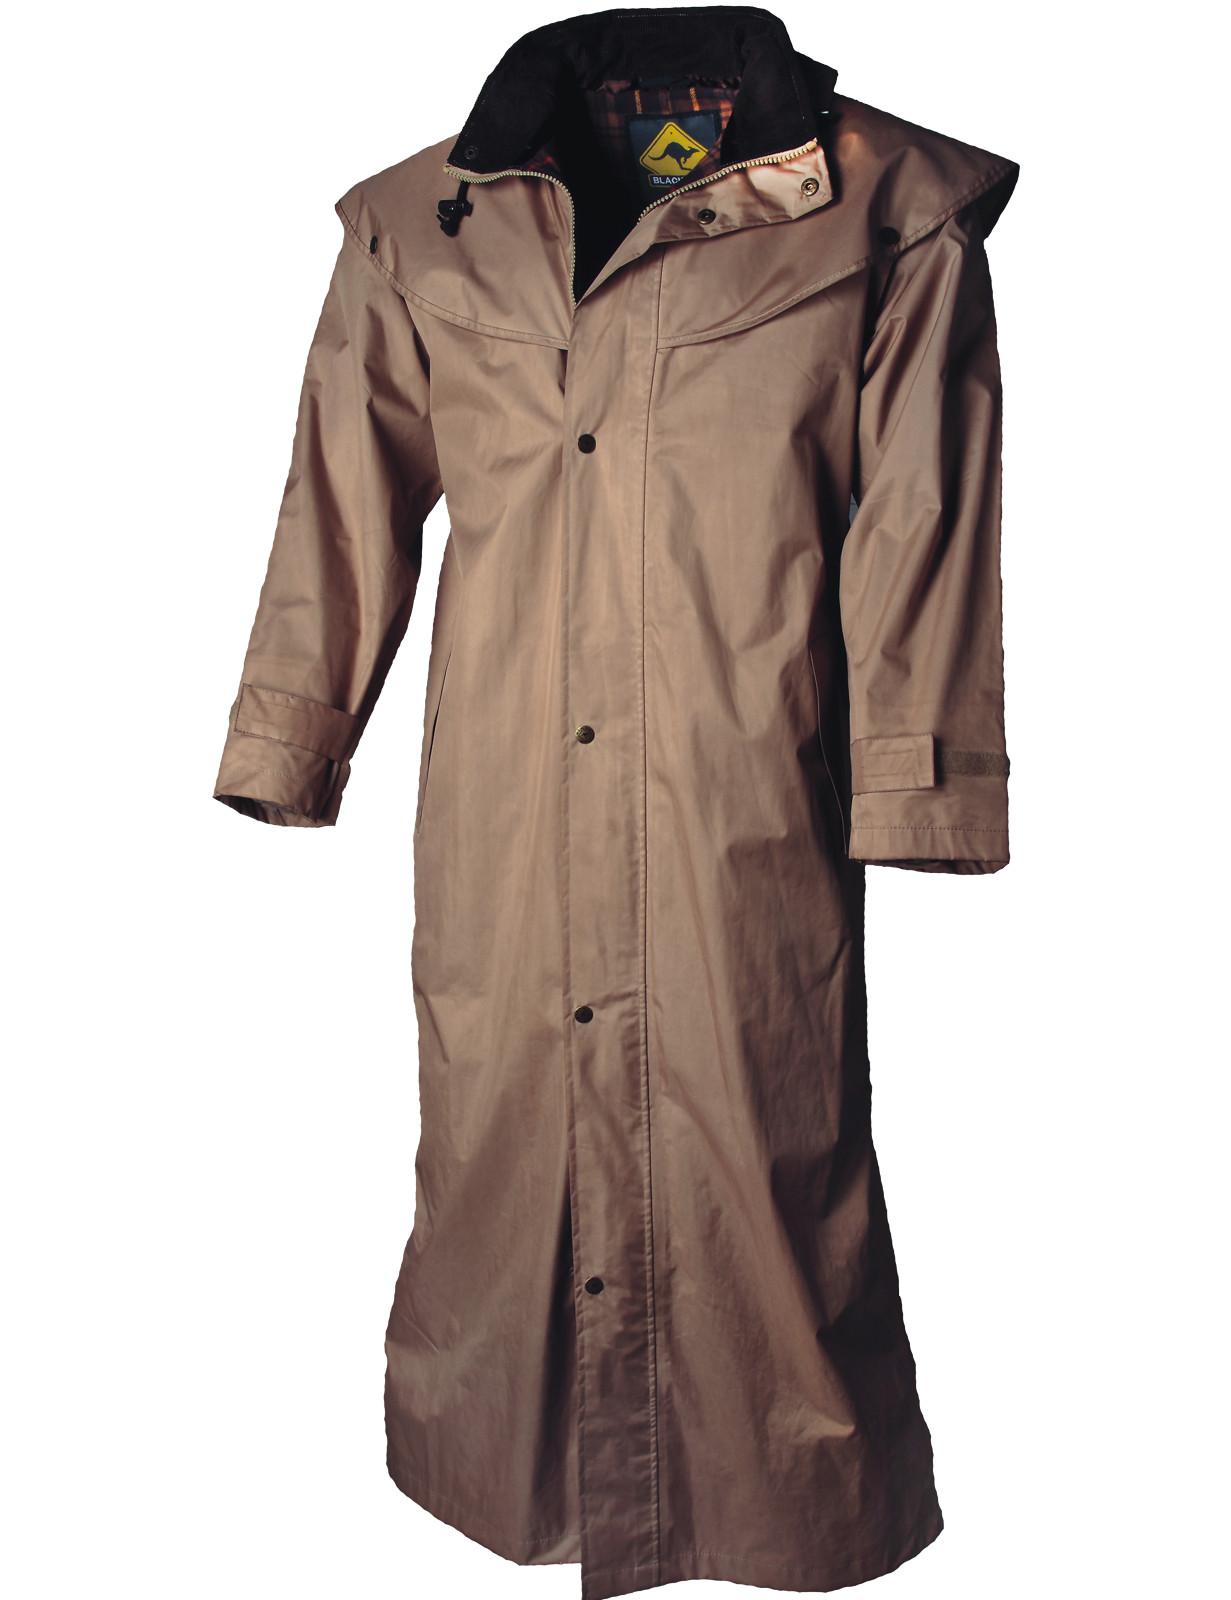 Black Roo »Stockman Coat« Mantel für Cowboys Biker BEIGE